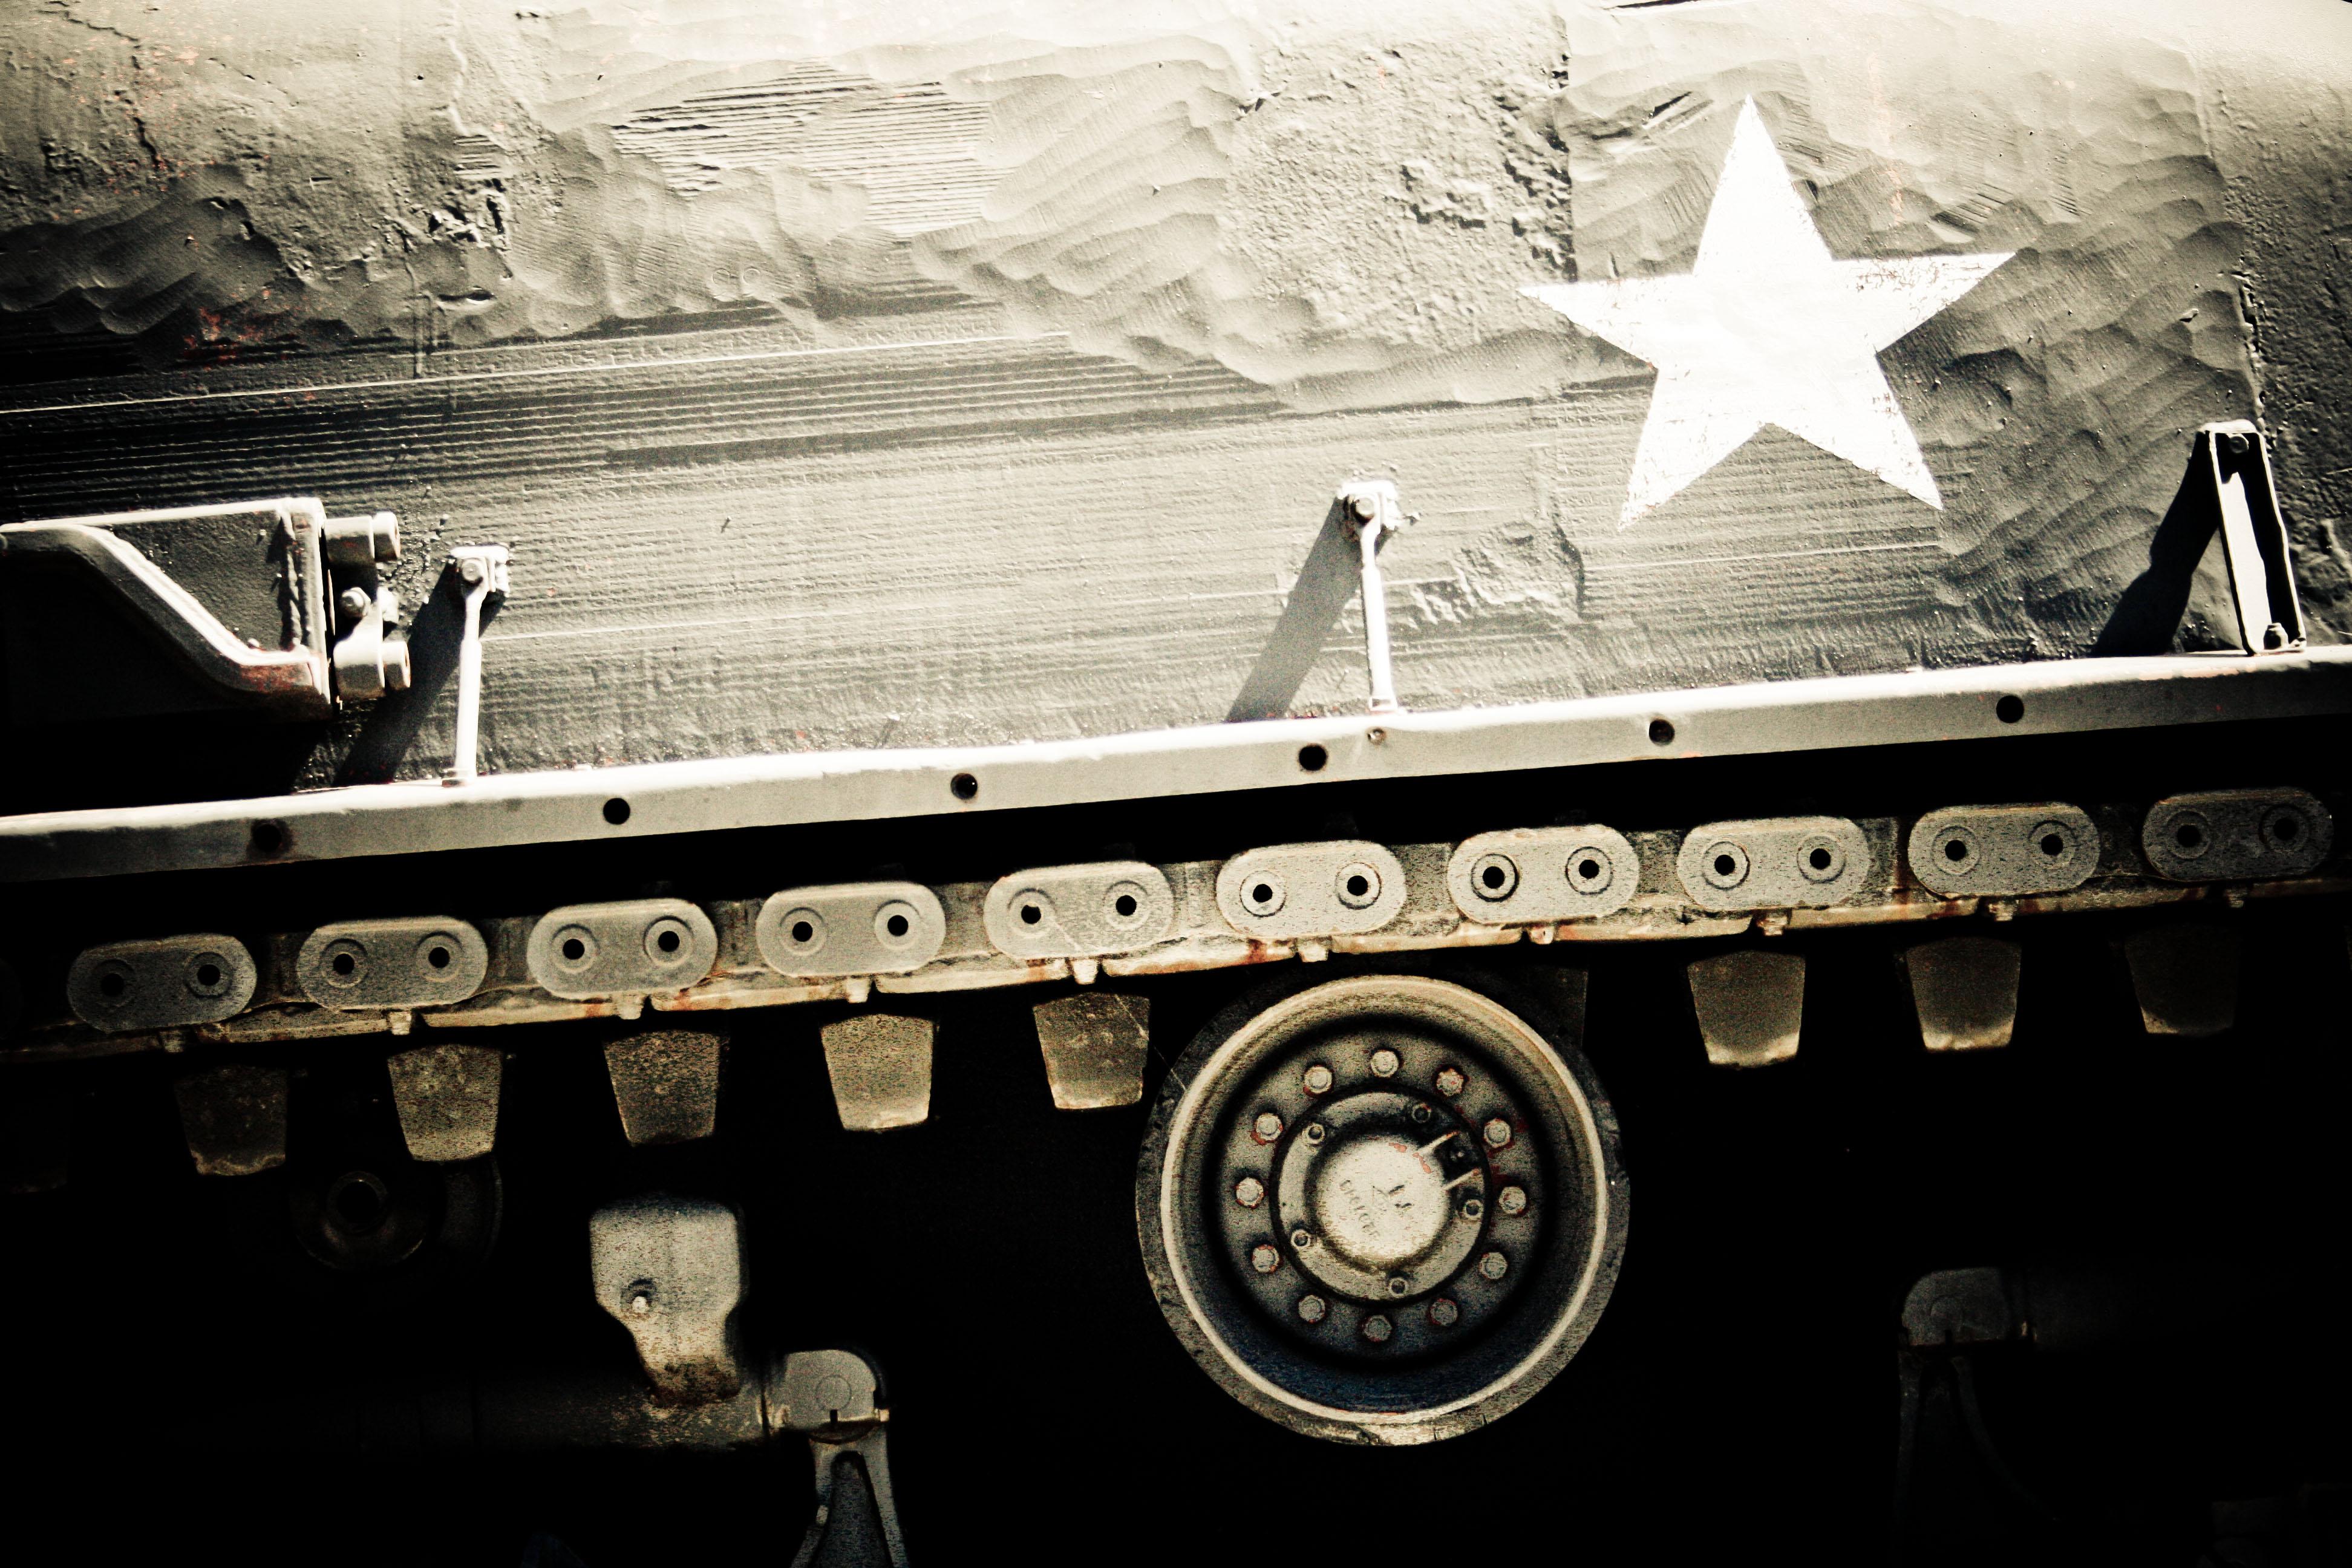 Military tank, Army, Wheel, War, Wallpaper, HQ Photo